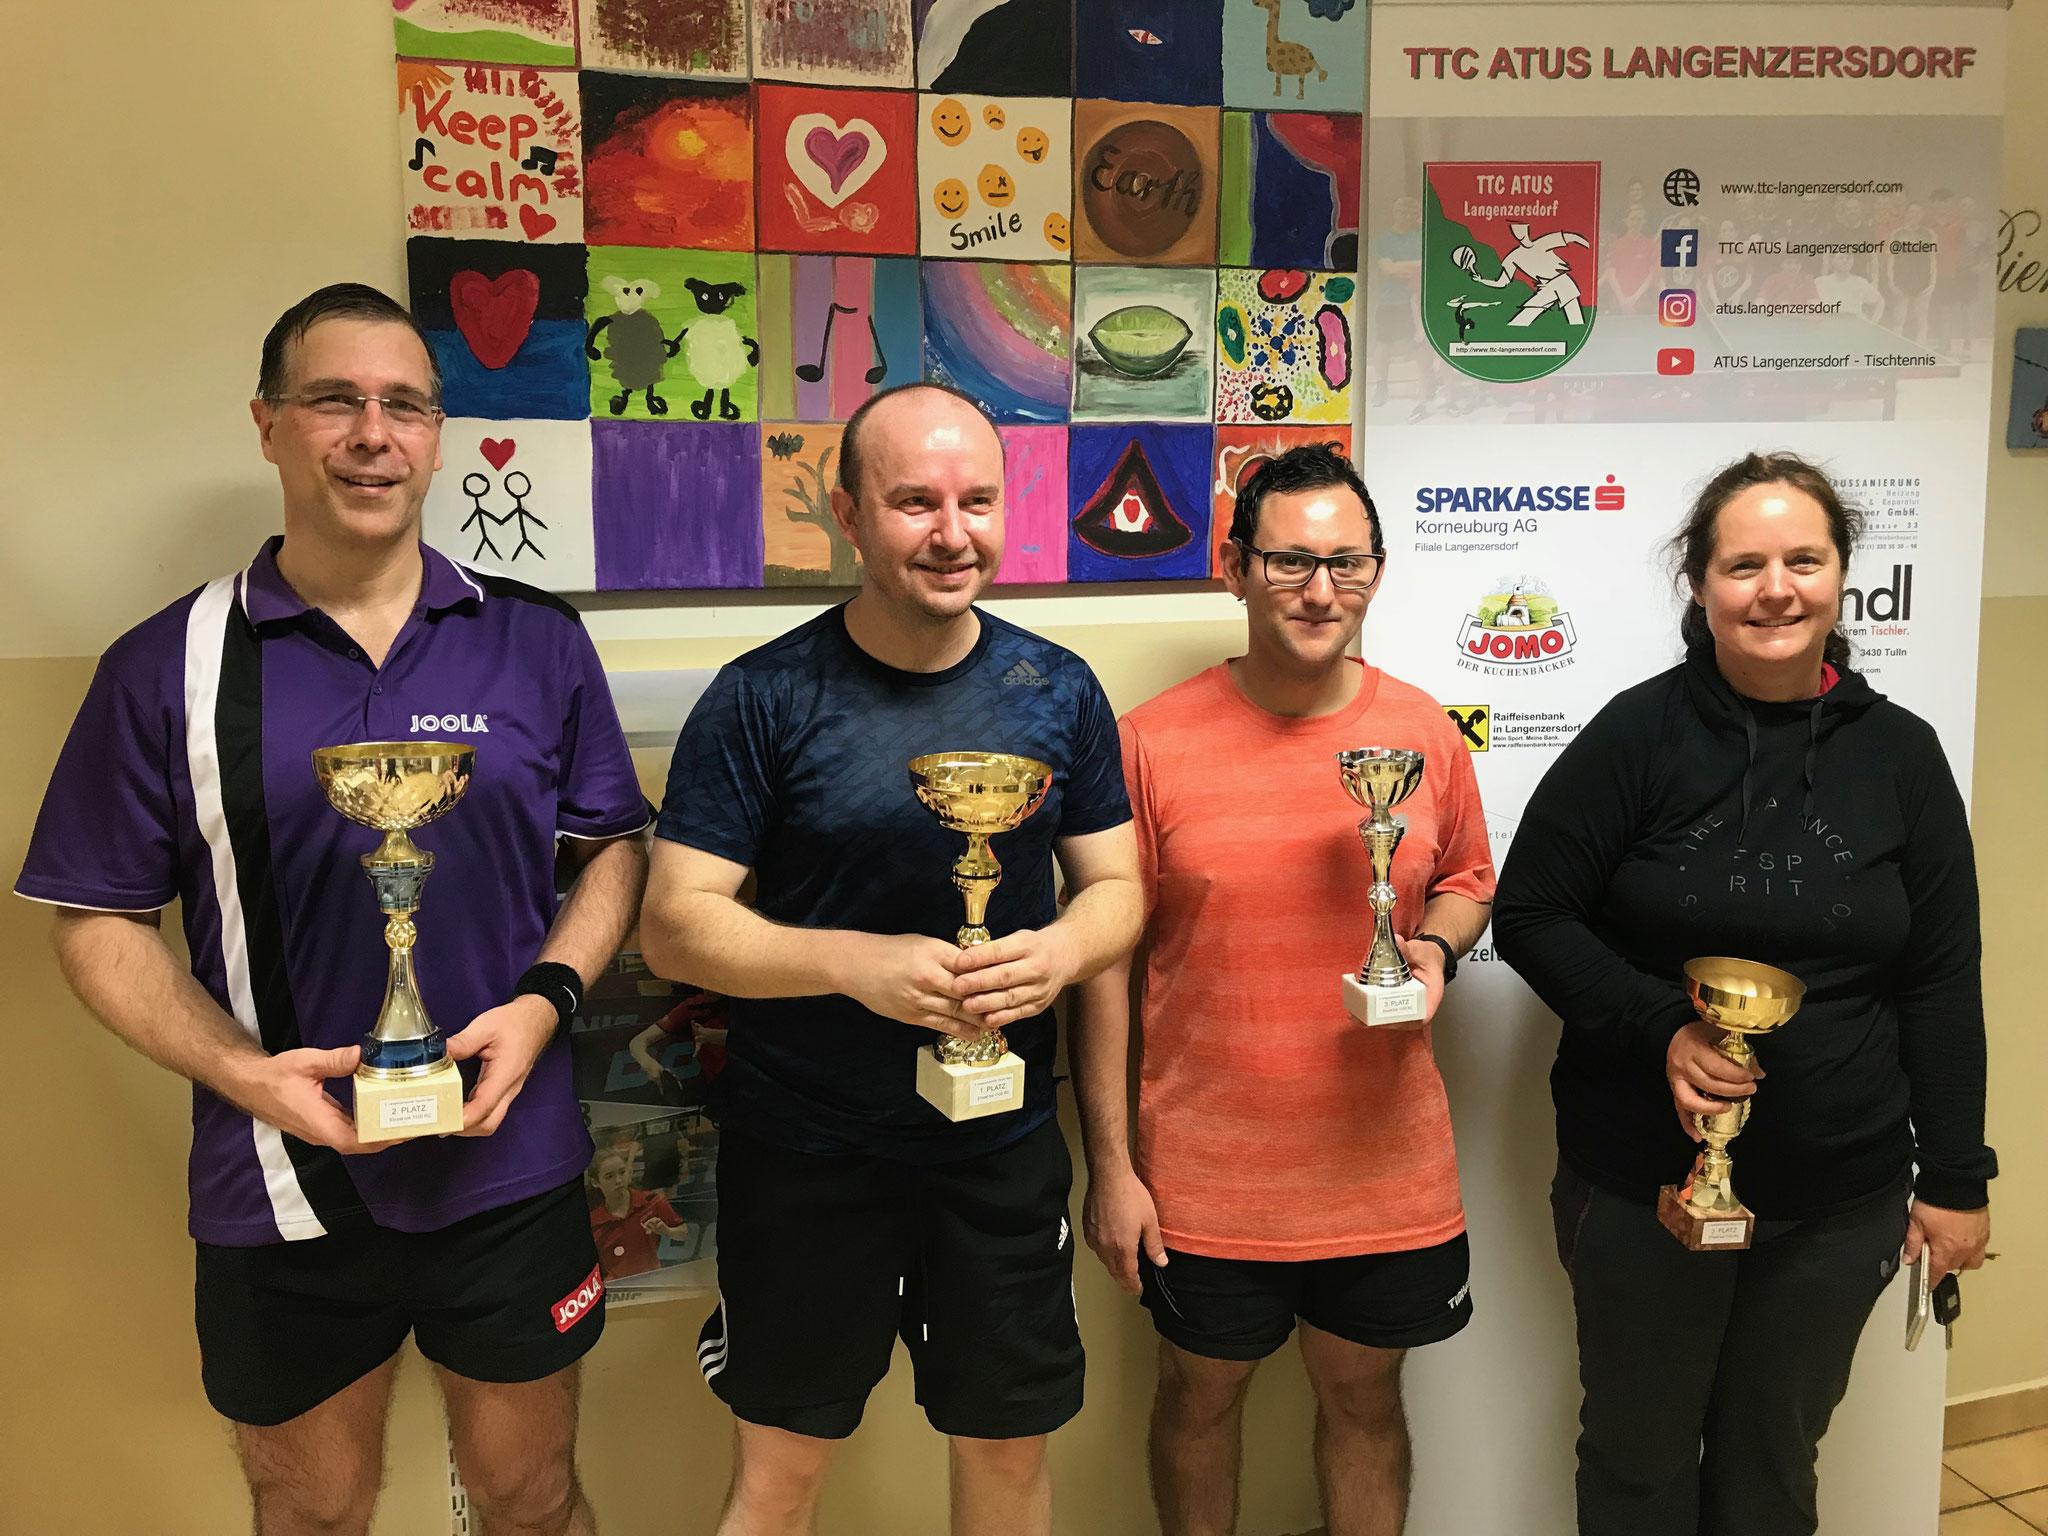 Siegerfoto Bewerb D: v.l.n.r. Christian Börner (WPAE) (Platz 2), Pawel Piotr Galek (LENZ) (Sieger), Alexander Fletl (SSTO) und Eva Geineder (LENZ) (beide Platz 3)